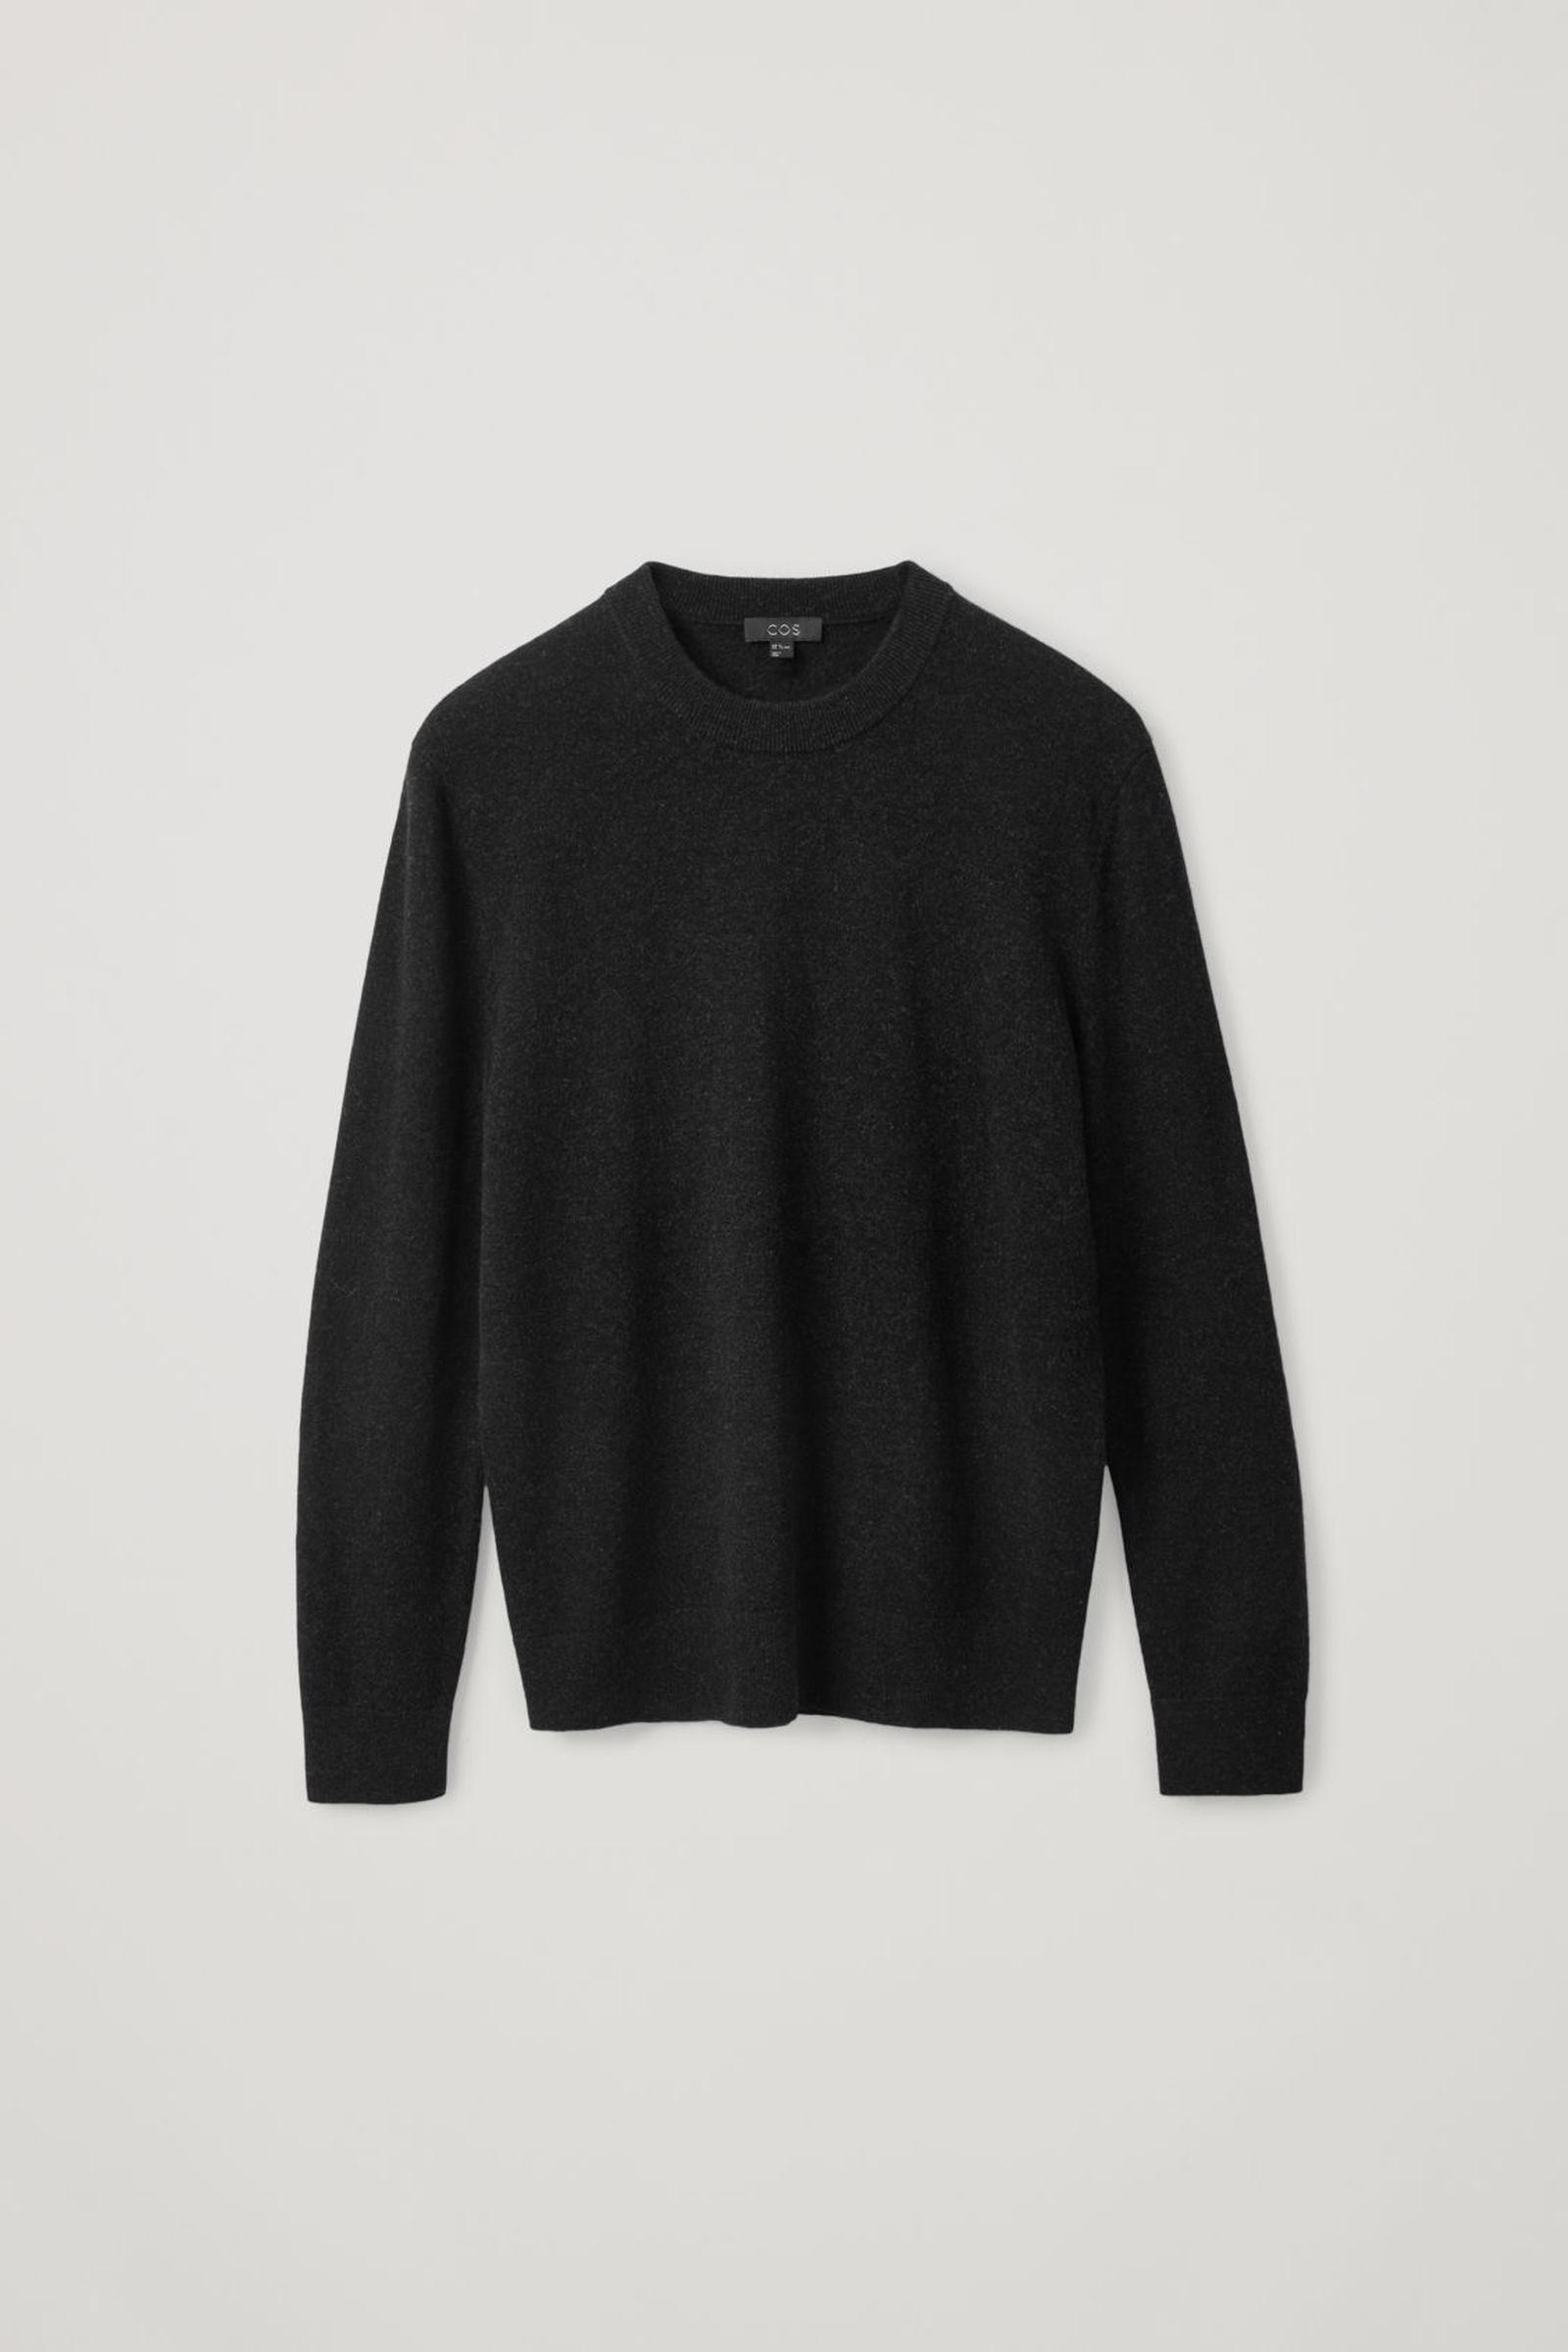 COS 메리노 야크 크루넥 스웨터의 블랙컬러 Product입니다.